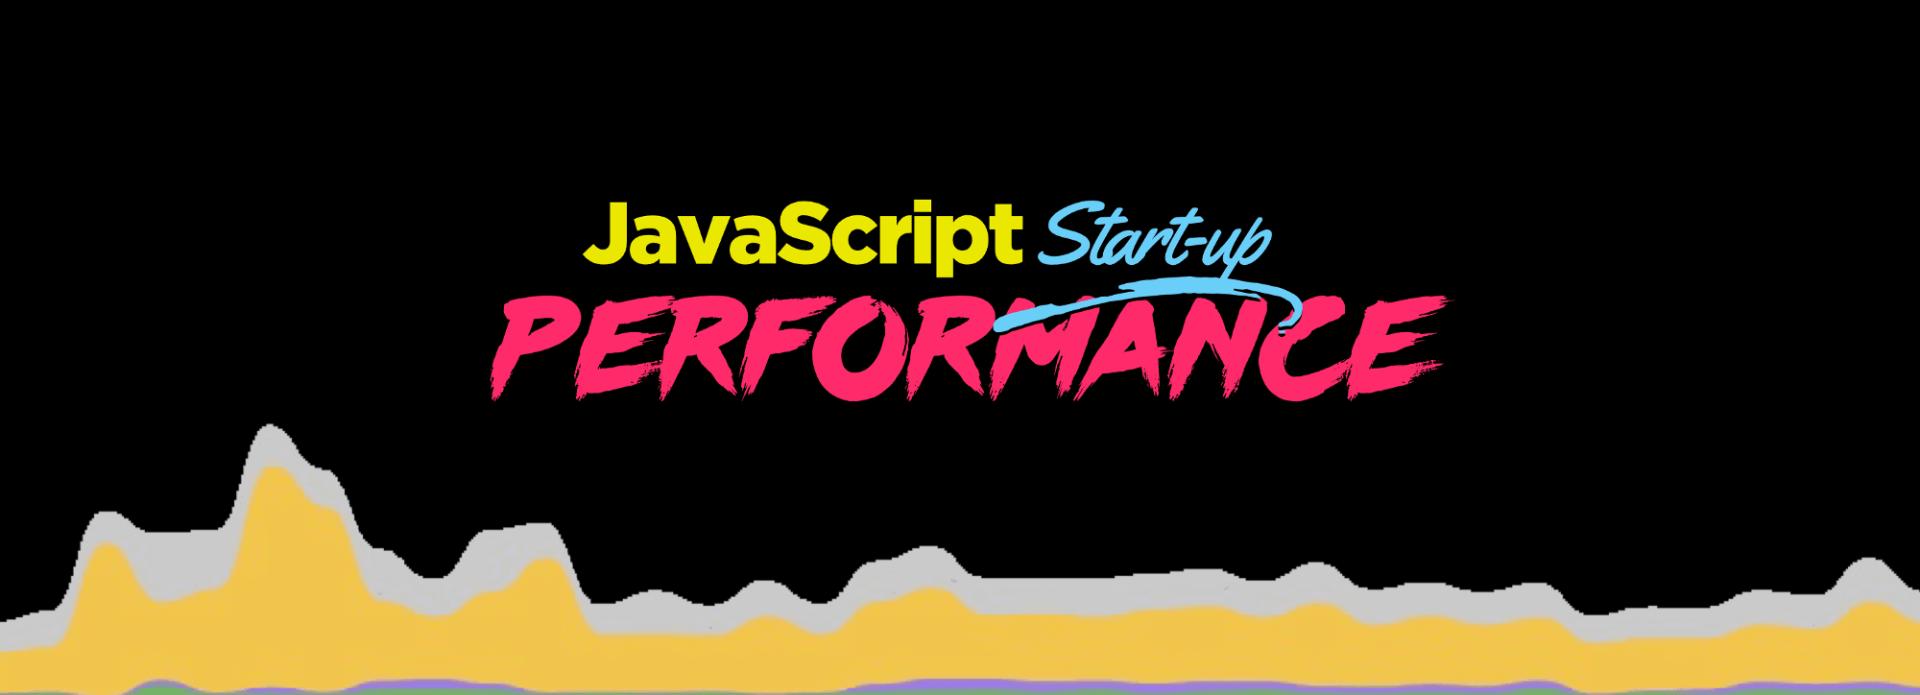 JavaScript 启动性能瓶颈分析与解决方案